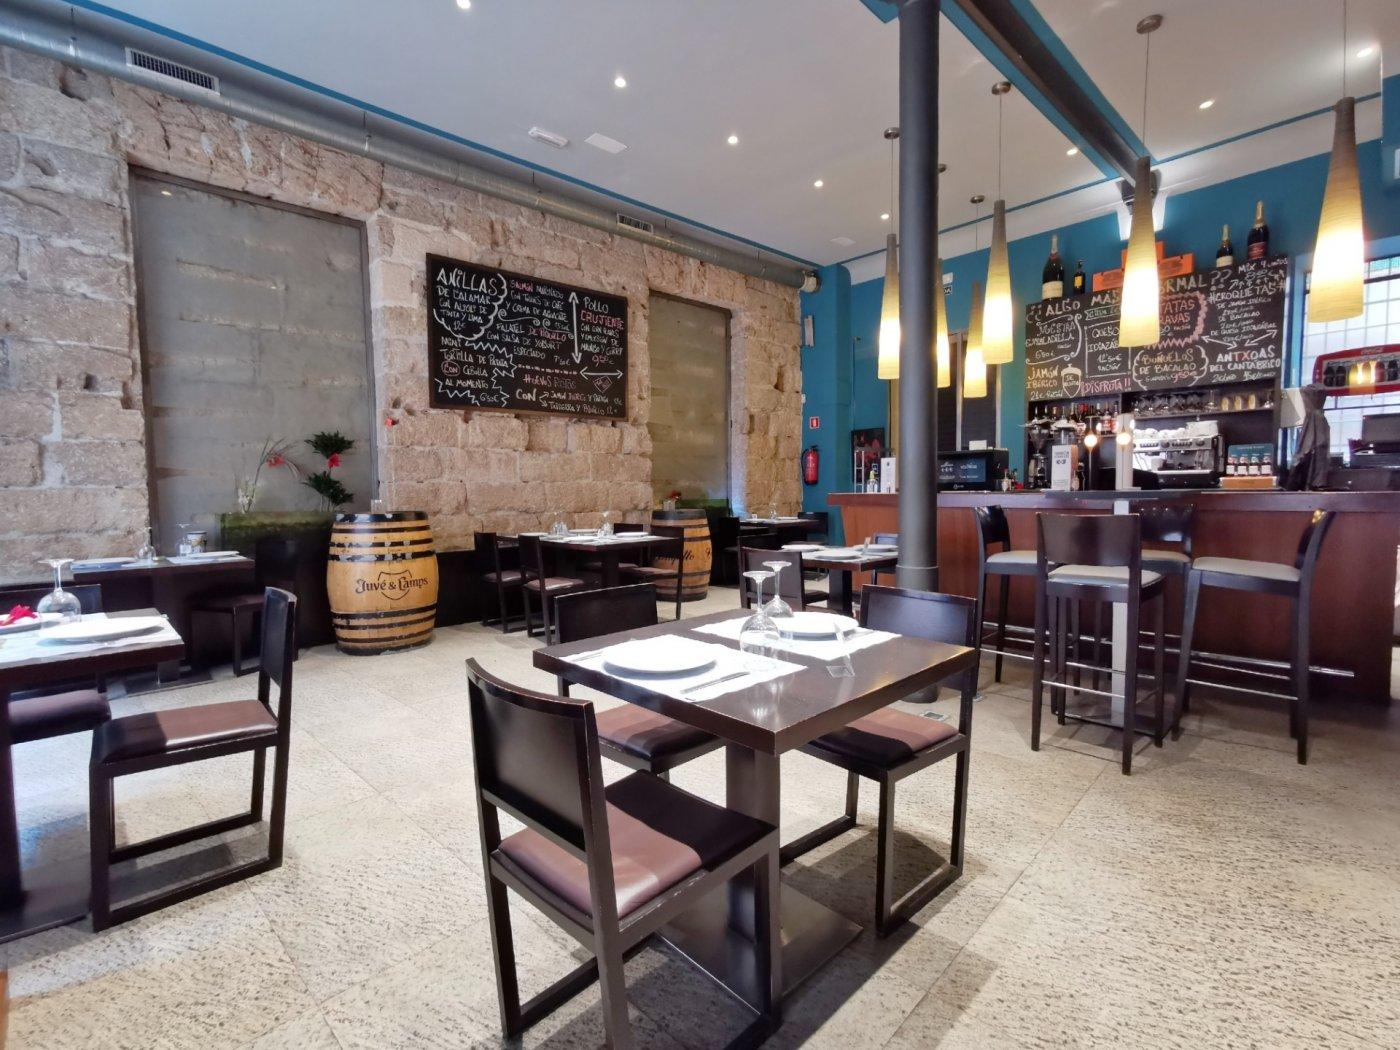 Se traspasa restaurante en centro de palma - imagenInmueble4